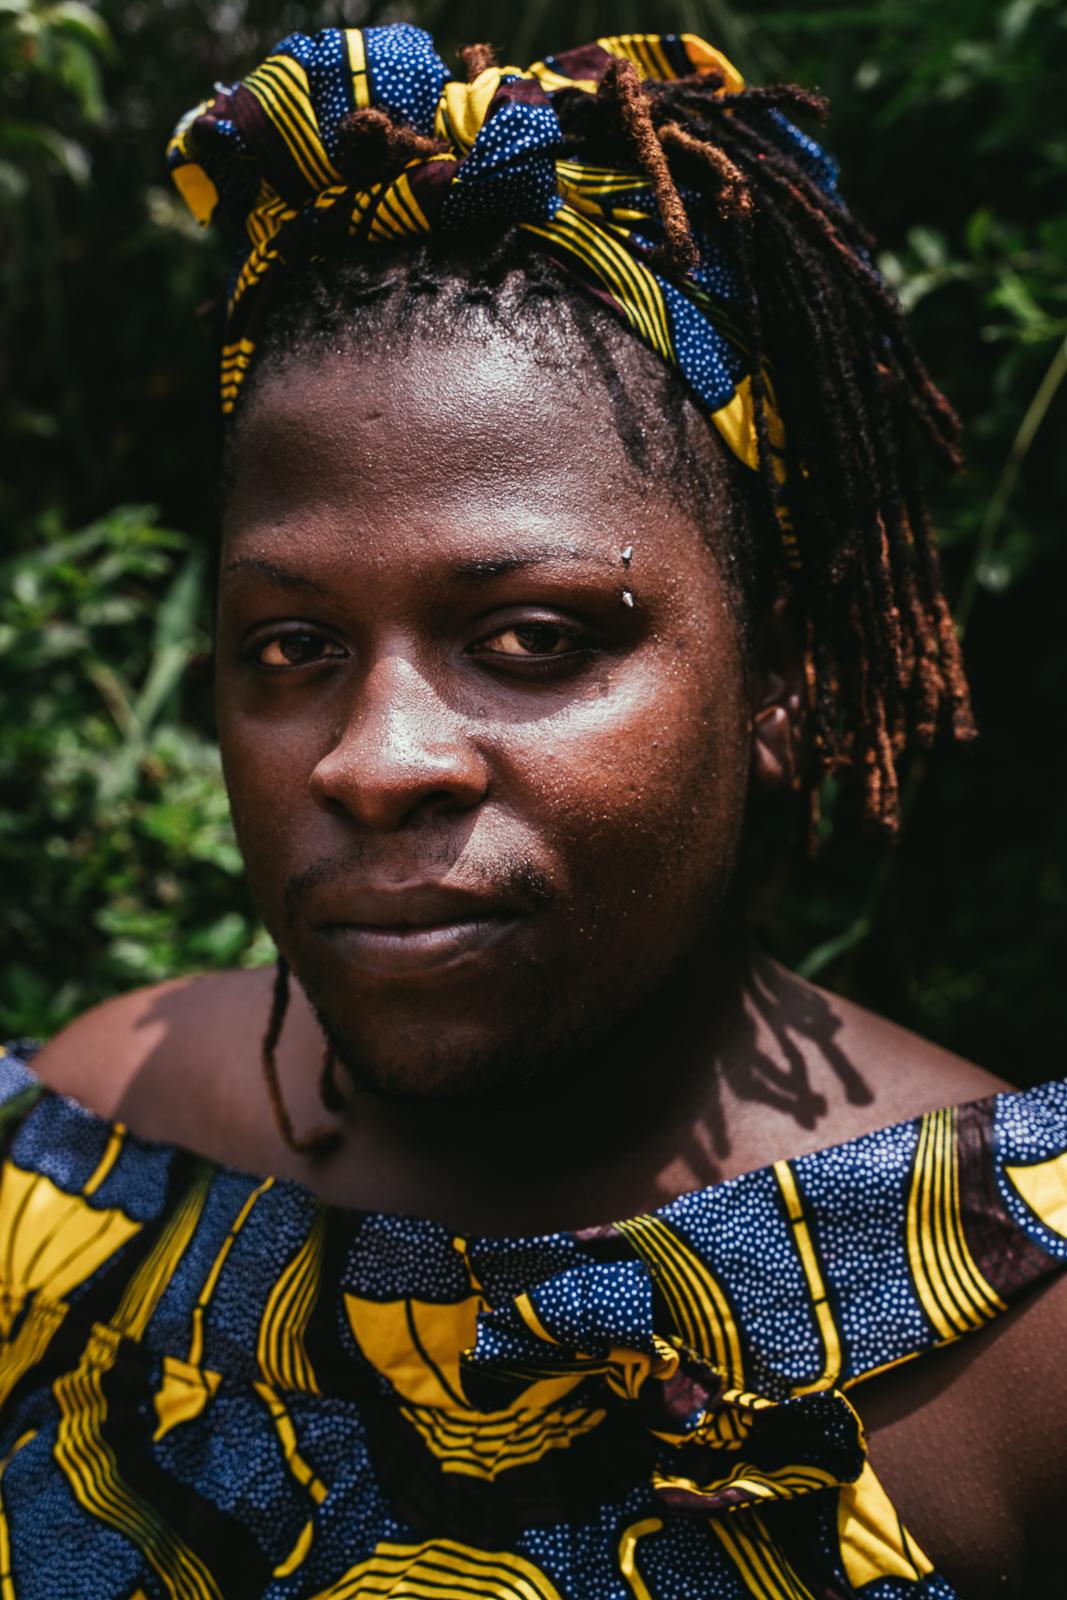 Queer_RebeccaRuetten_Uganda_Keem_web-08994.jpg